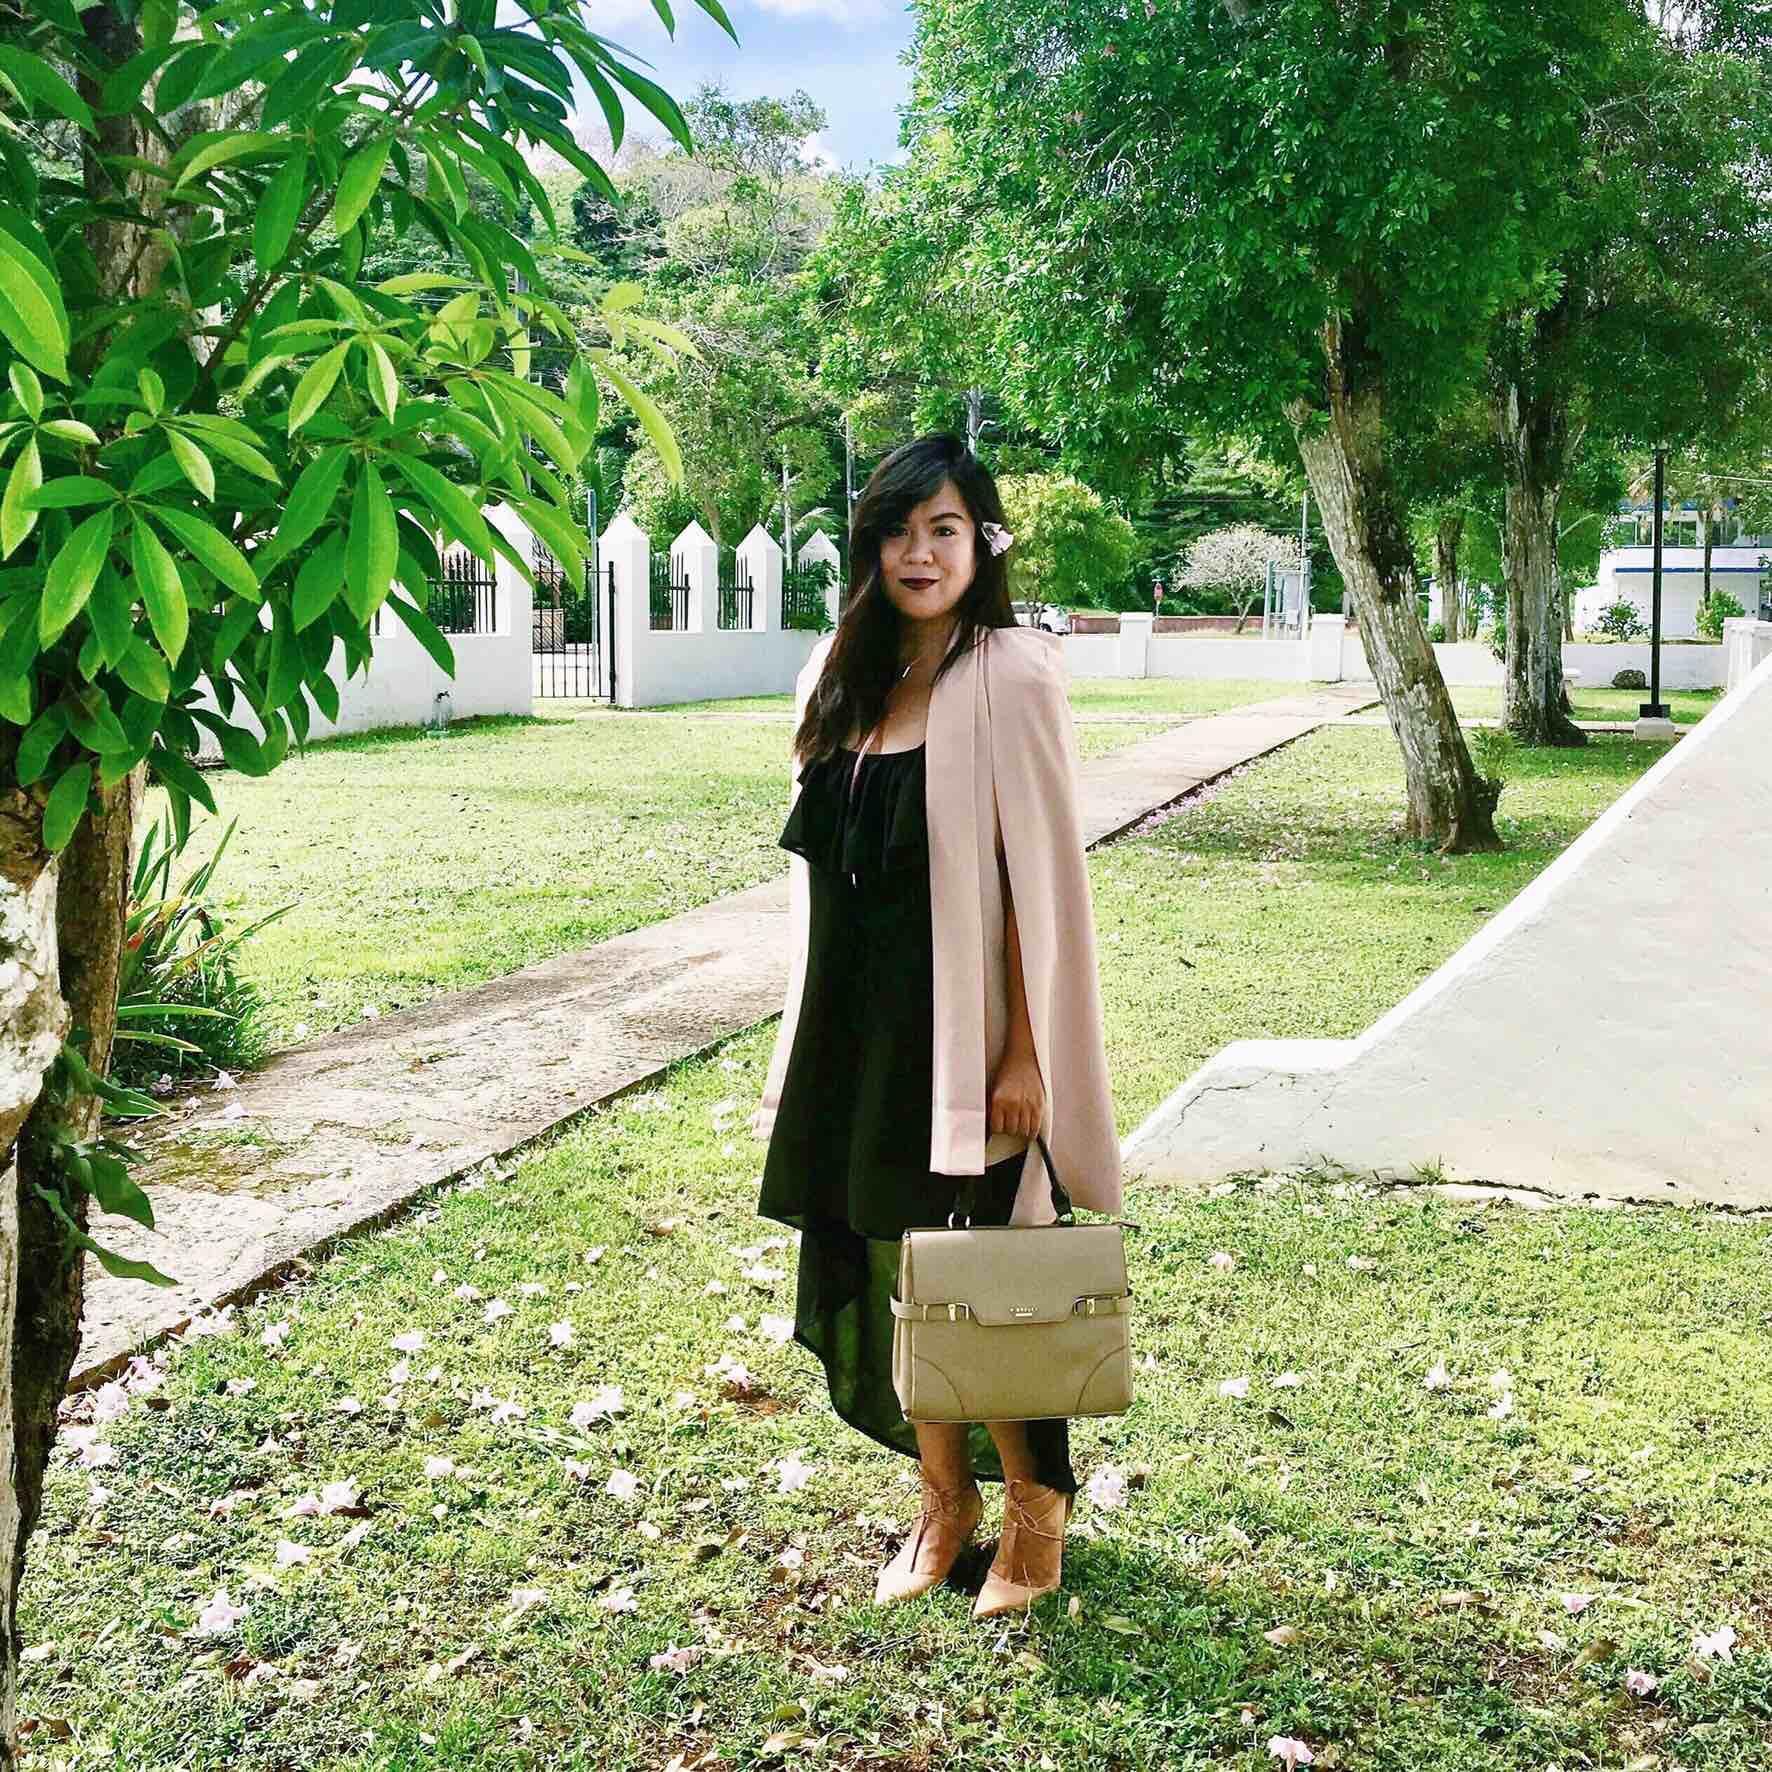 dressconfidently